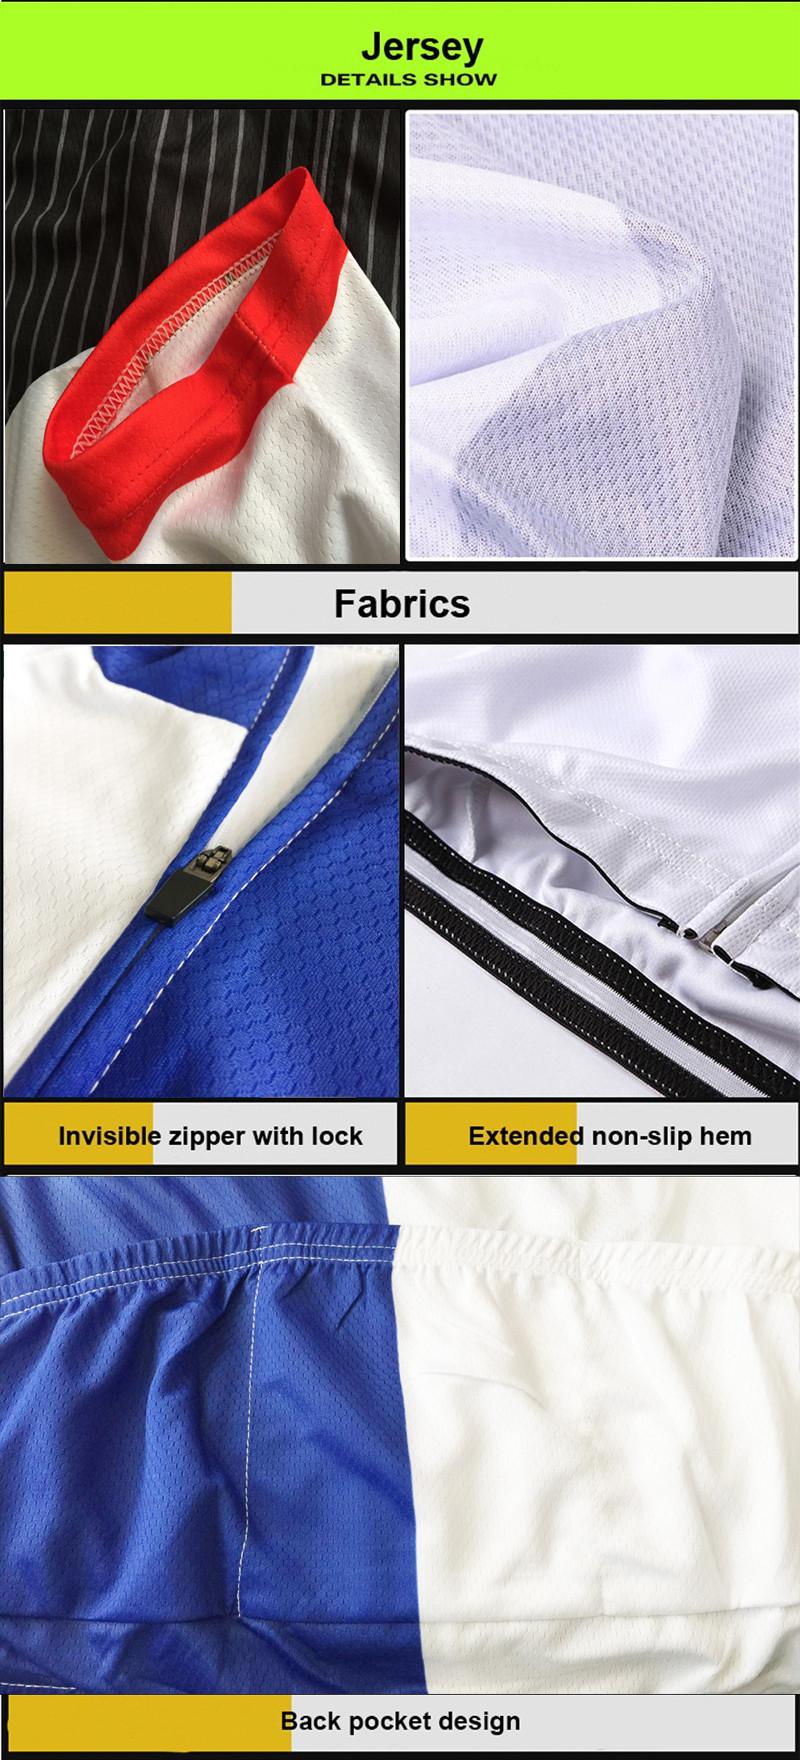 Jersey detail showing